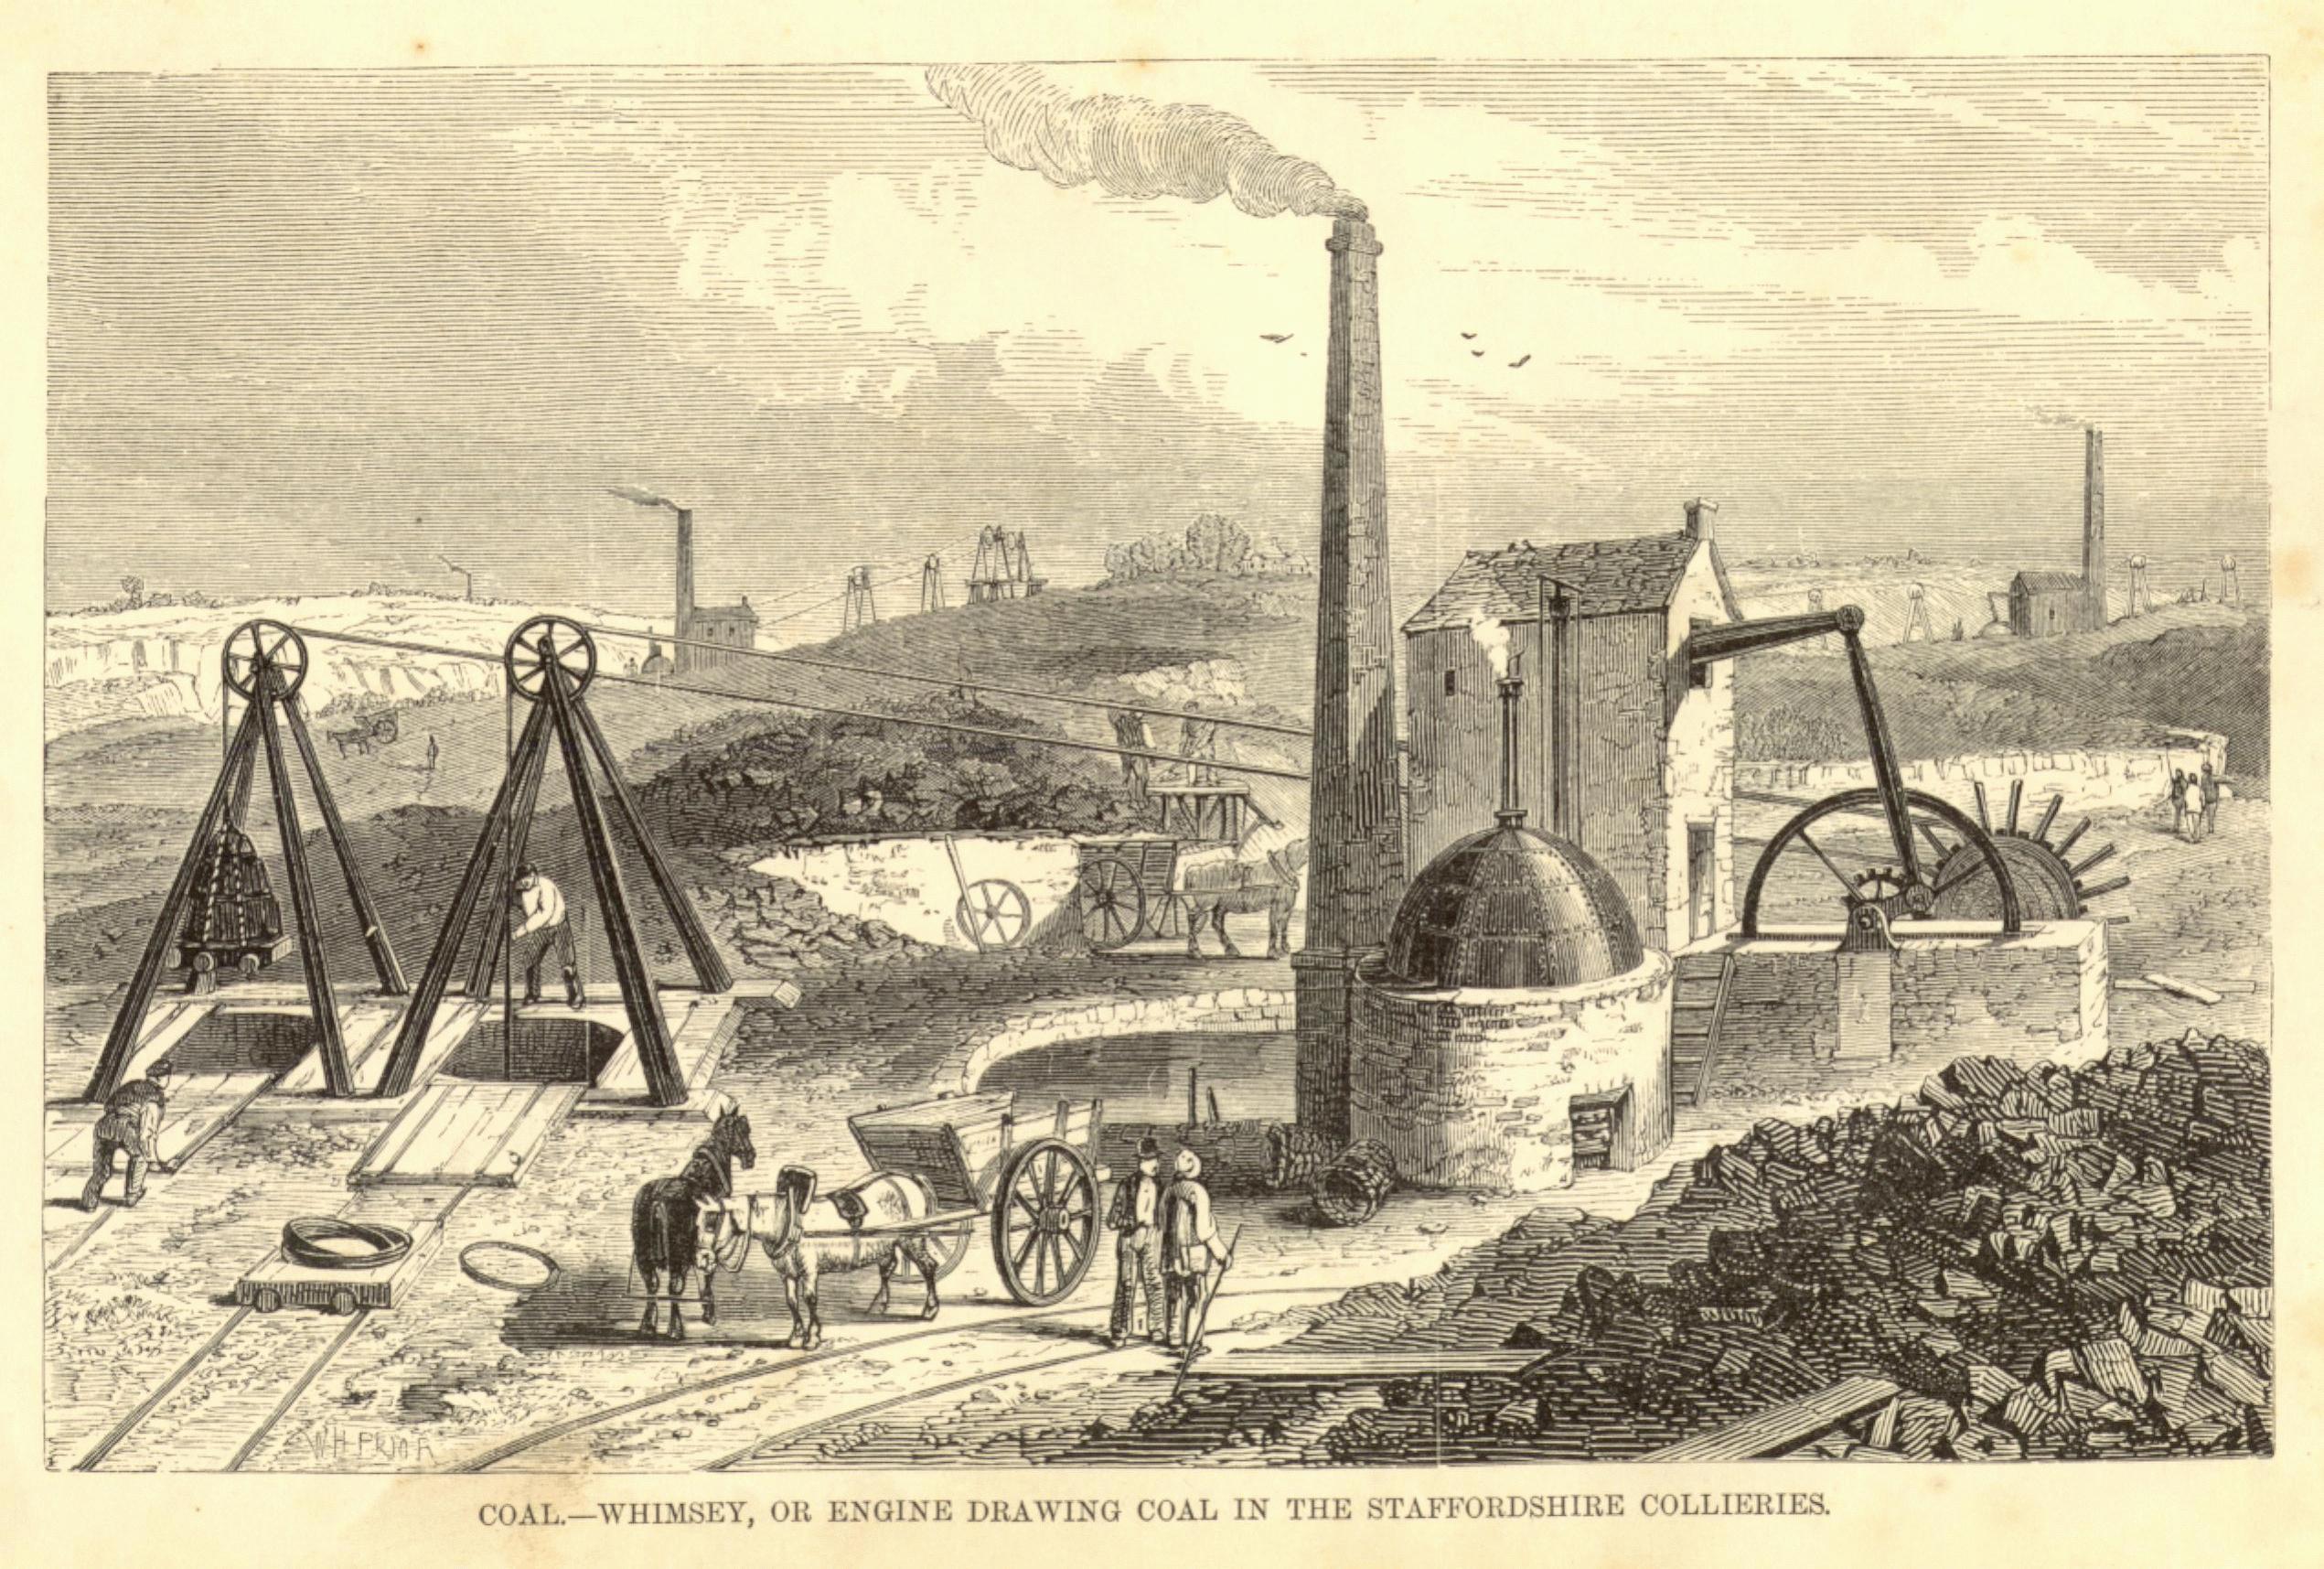 Coal Mining Drawings or Engine Drawing Coal in